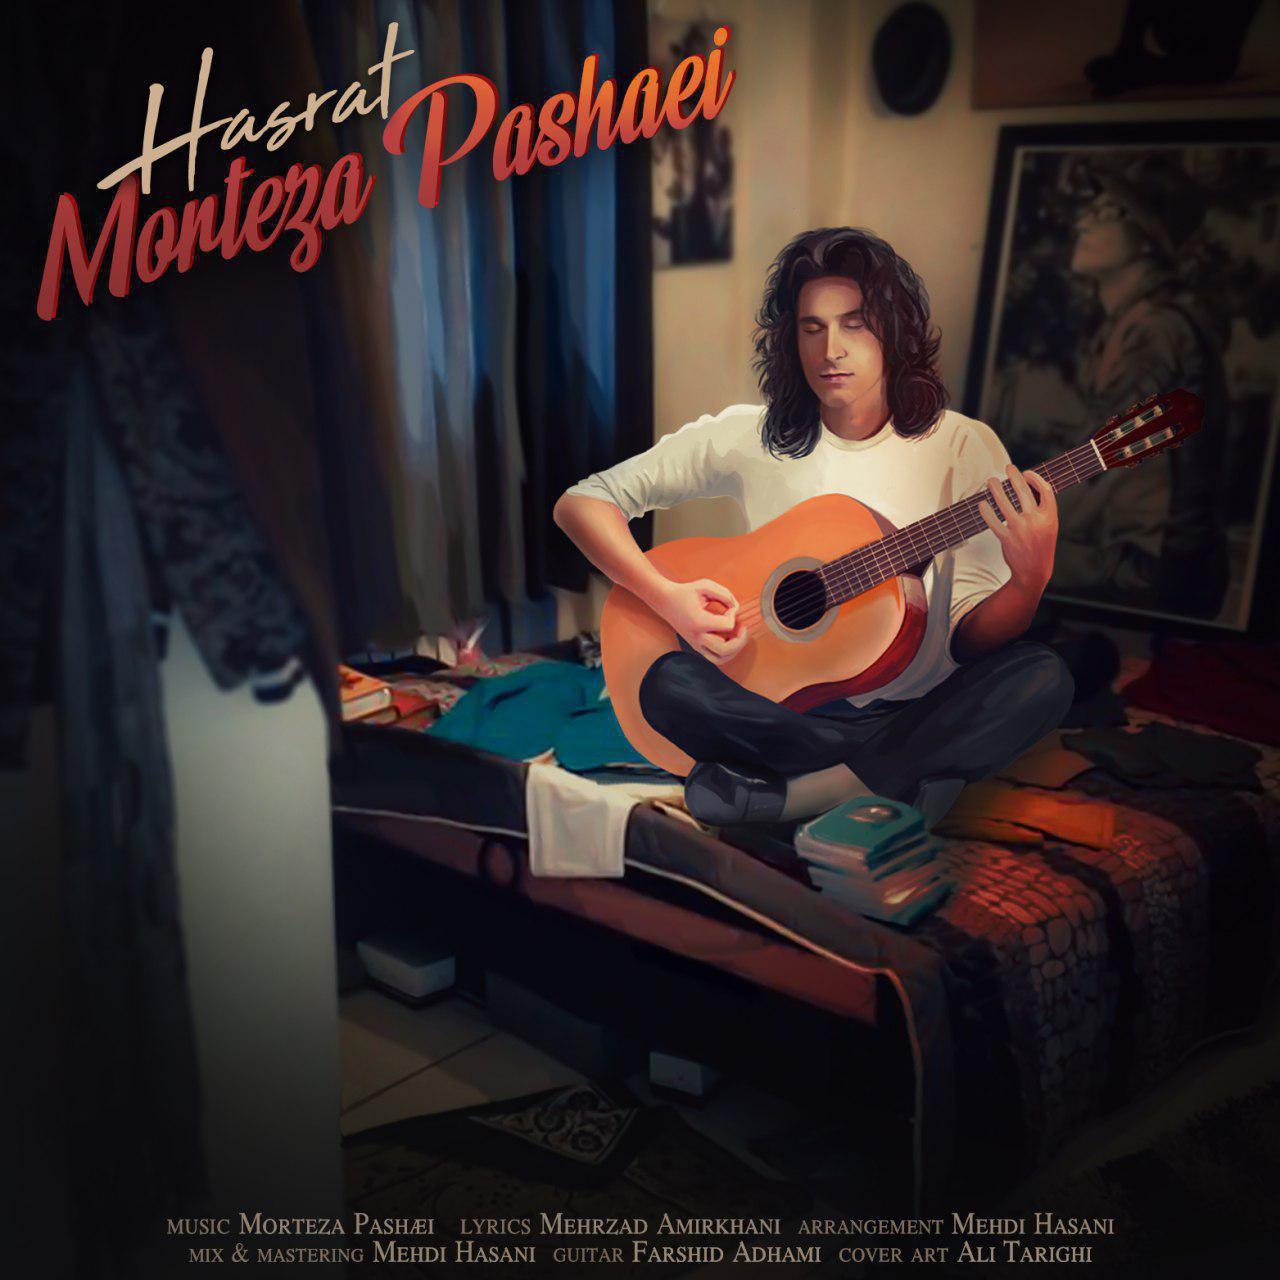 Morteza Pashaei - Hasrat Music | آهنگ مرتضی پاشایی - حسرت